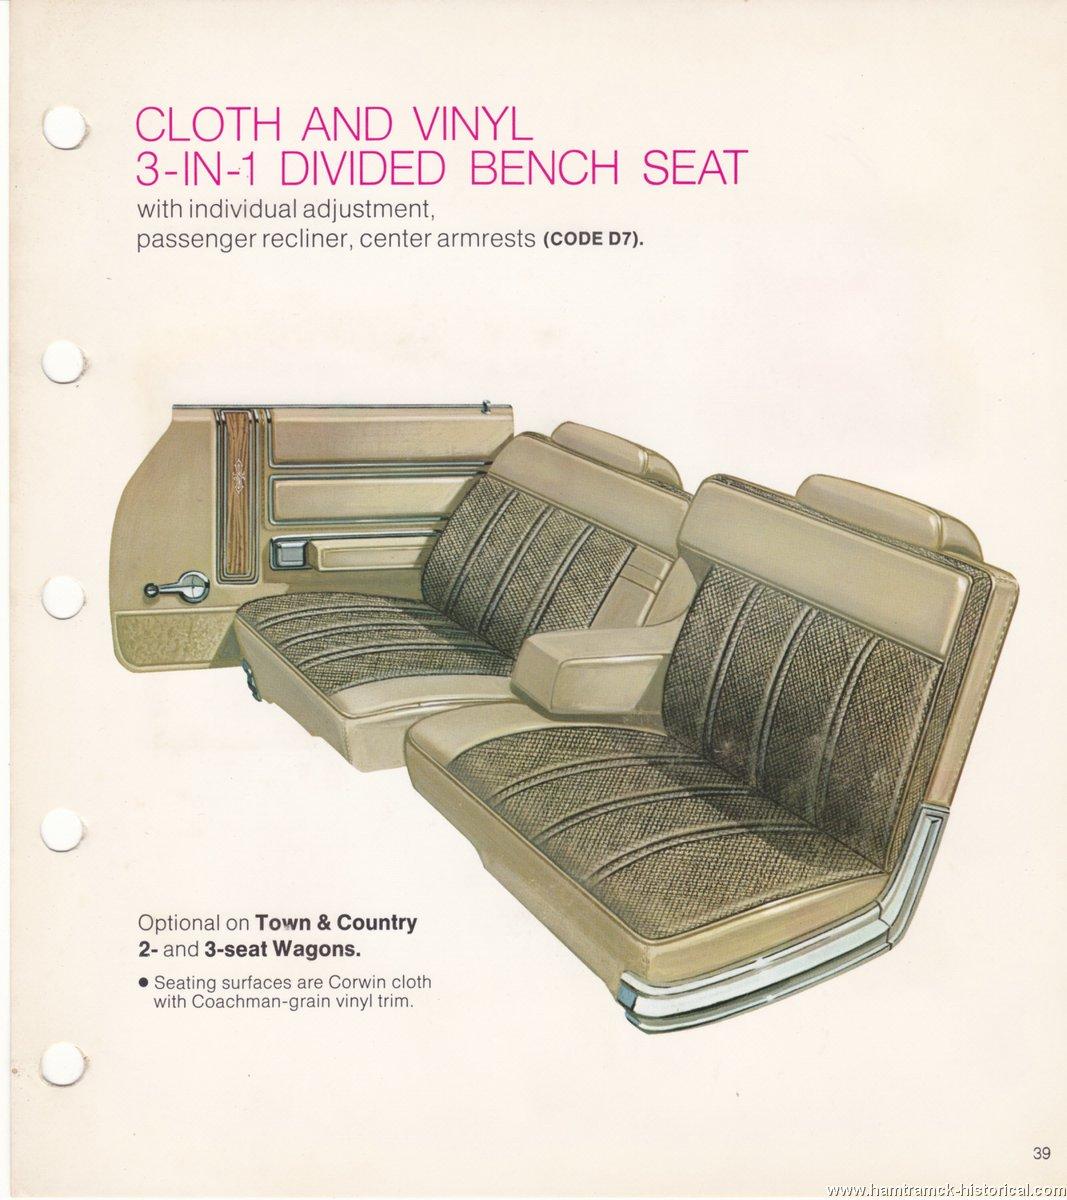 Rattletrap Car Coloring Pages : Chrysler drew a blank for c bodies only classic mopar forum